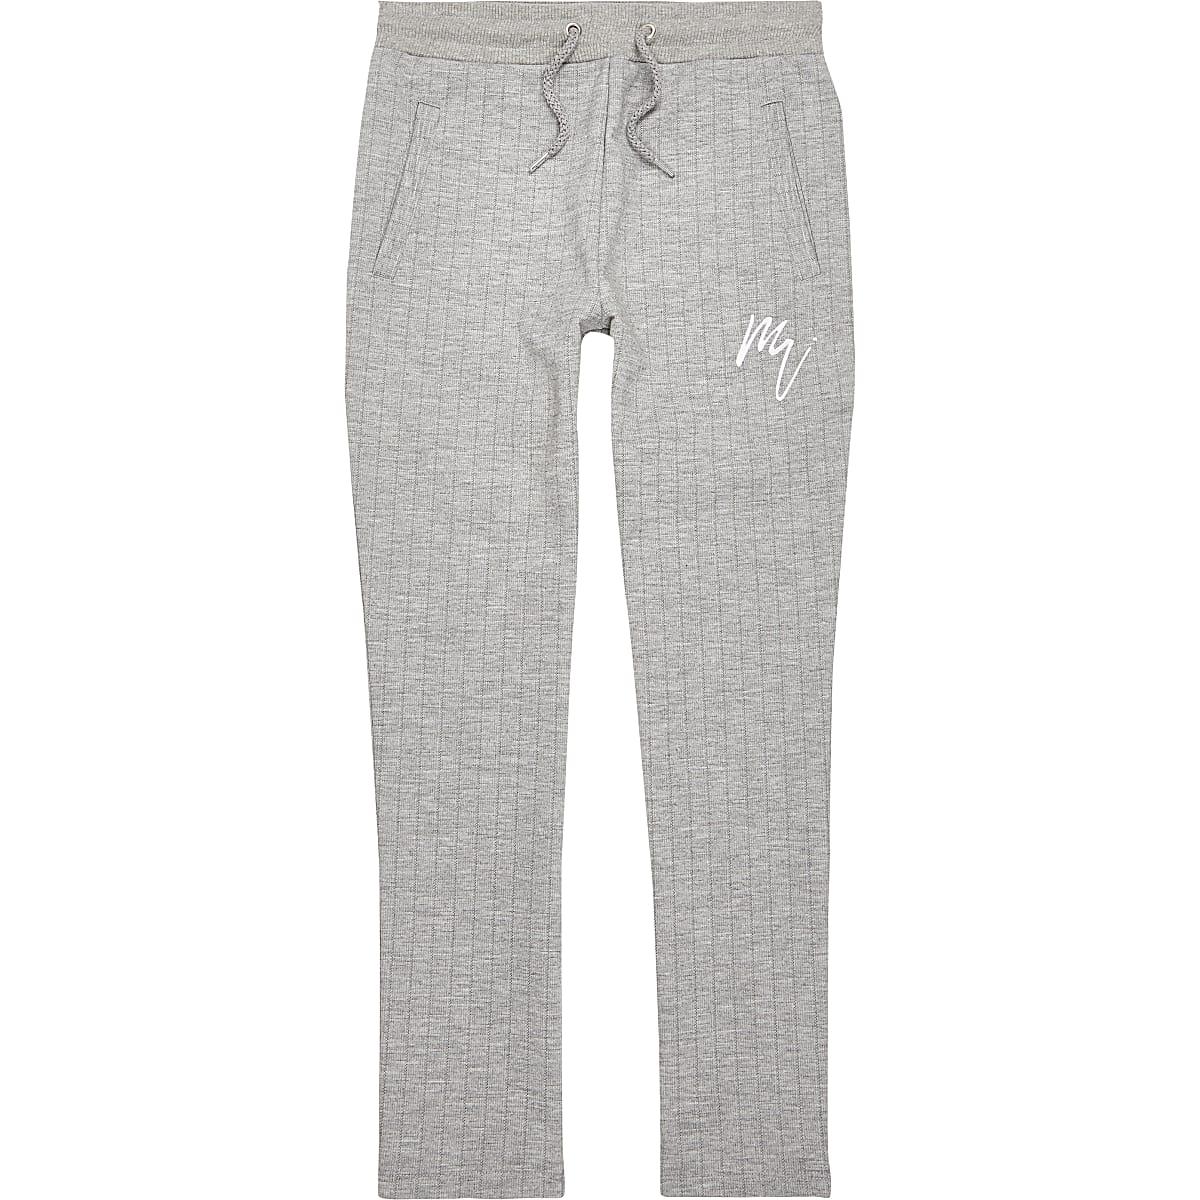 Grey pinstripe smart joggers